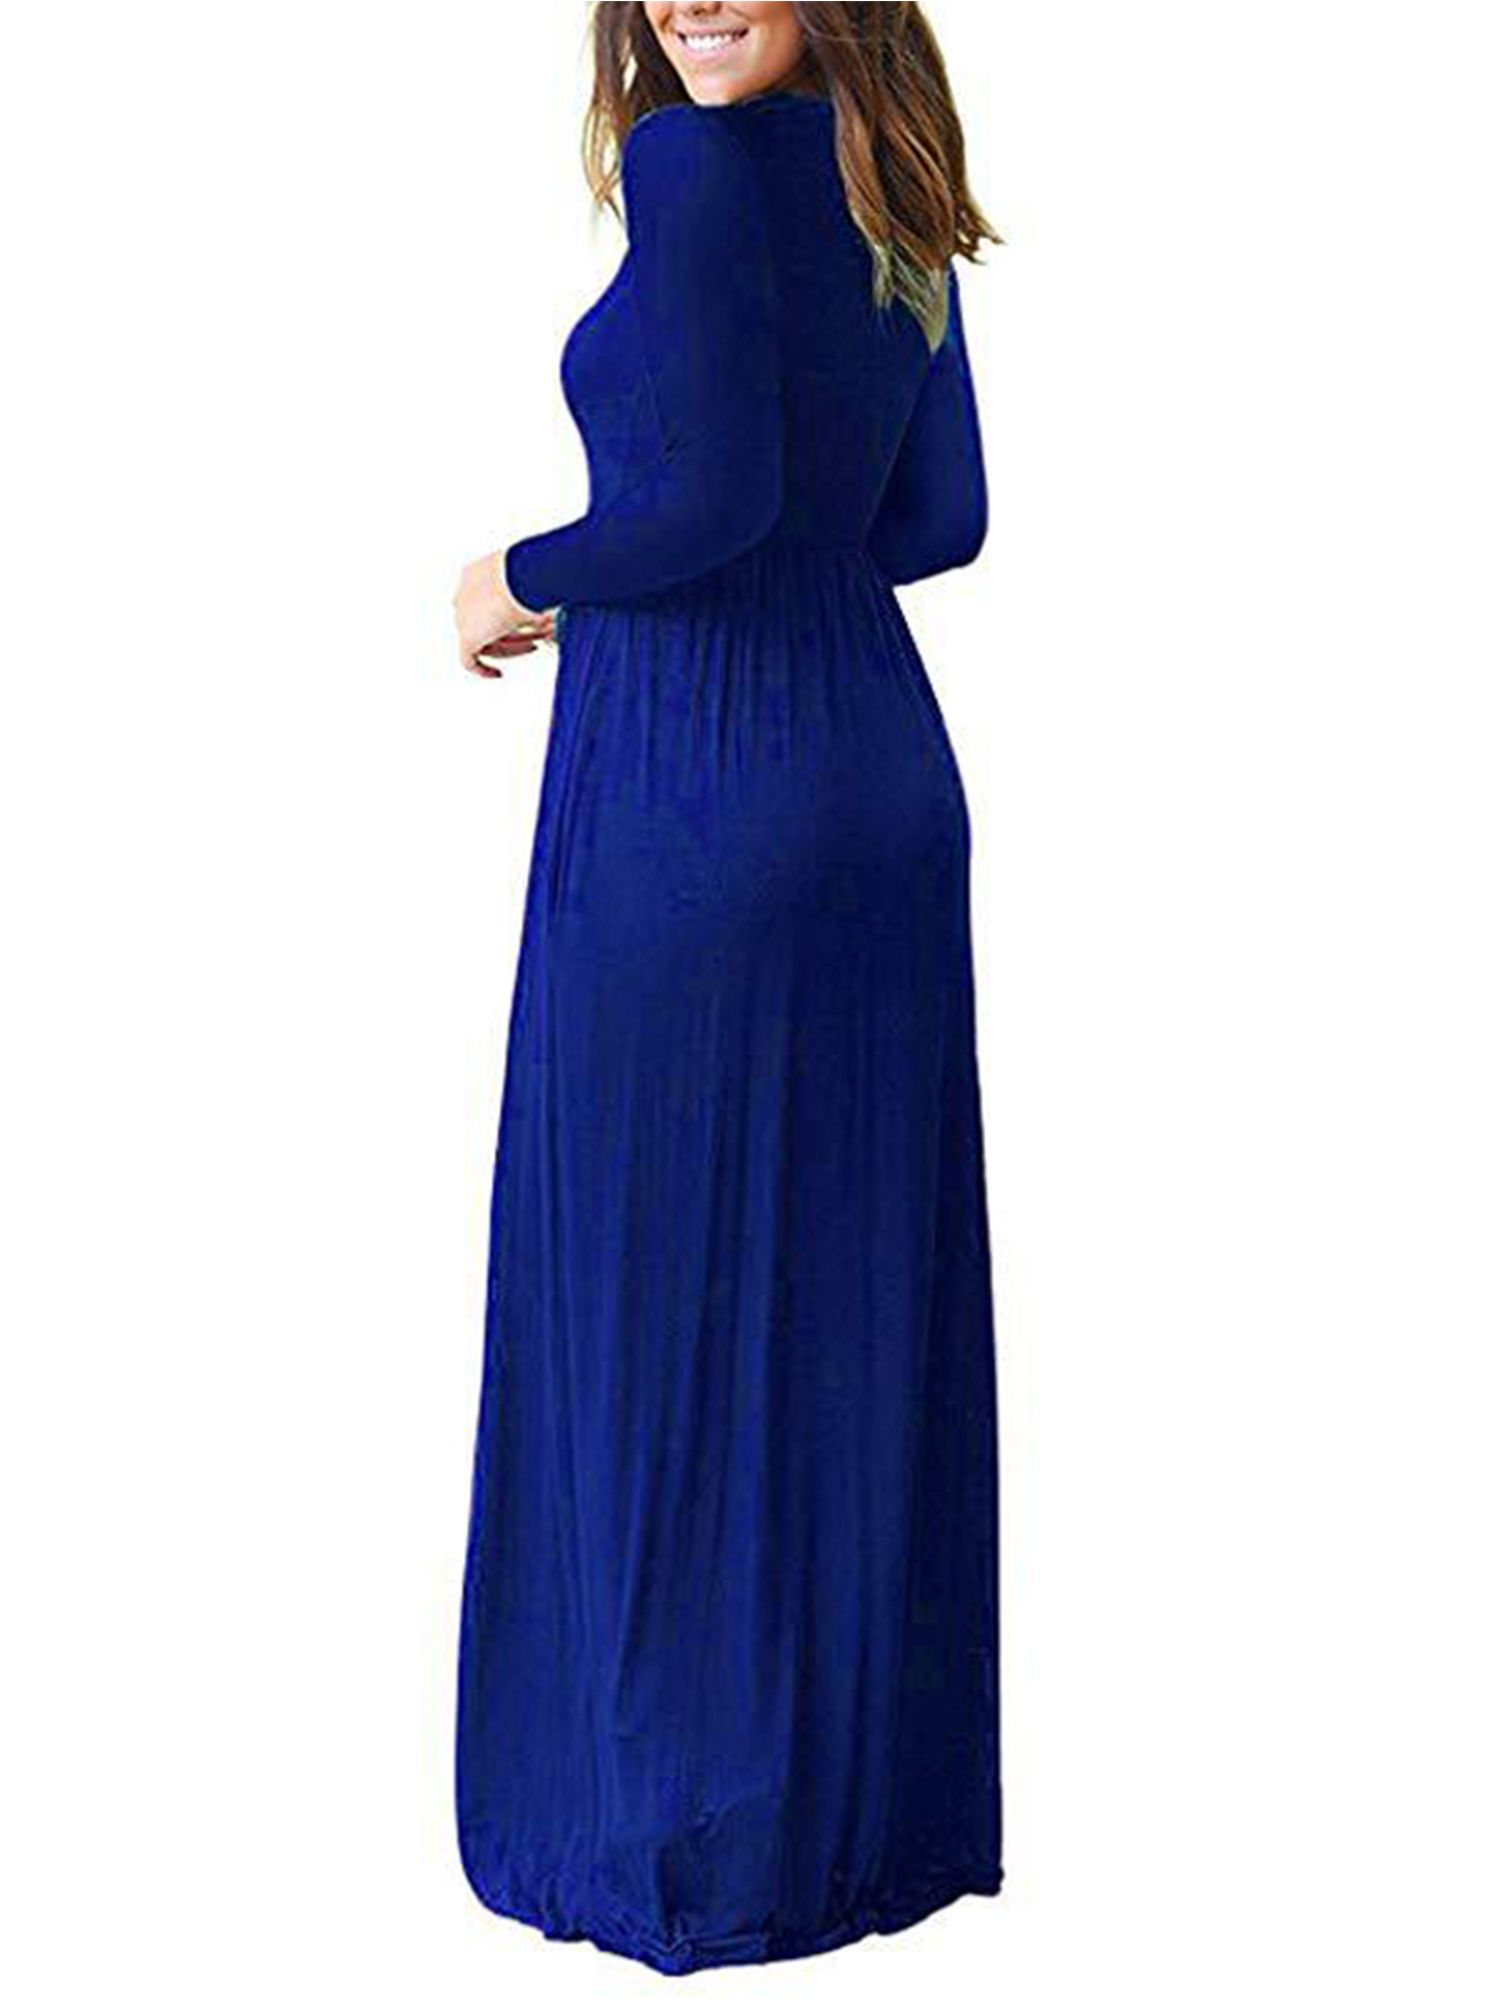 Wodstyle Women Casual Long Sleeve Plain Party Boho Maxi Dress Walmart Com Boho Maxi Dress Maxi Dress Style Maxi Dress [ 2000 x 1500 Pixel ]